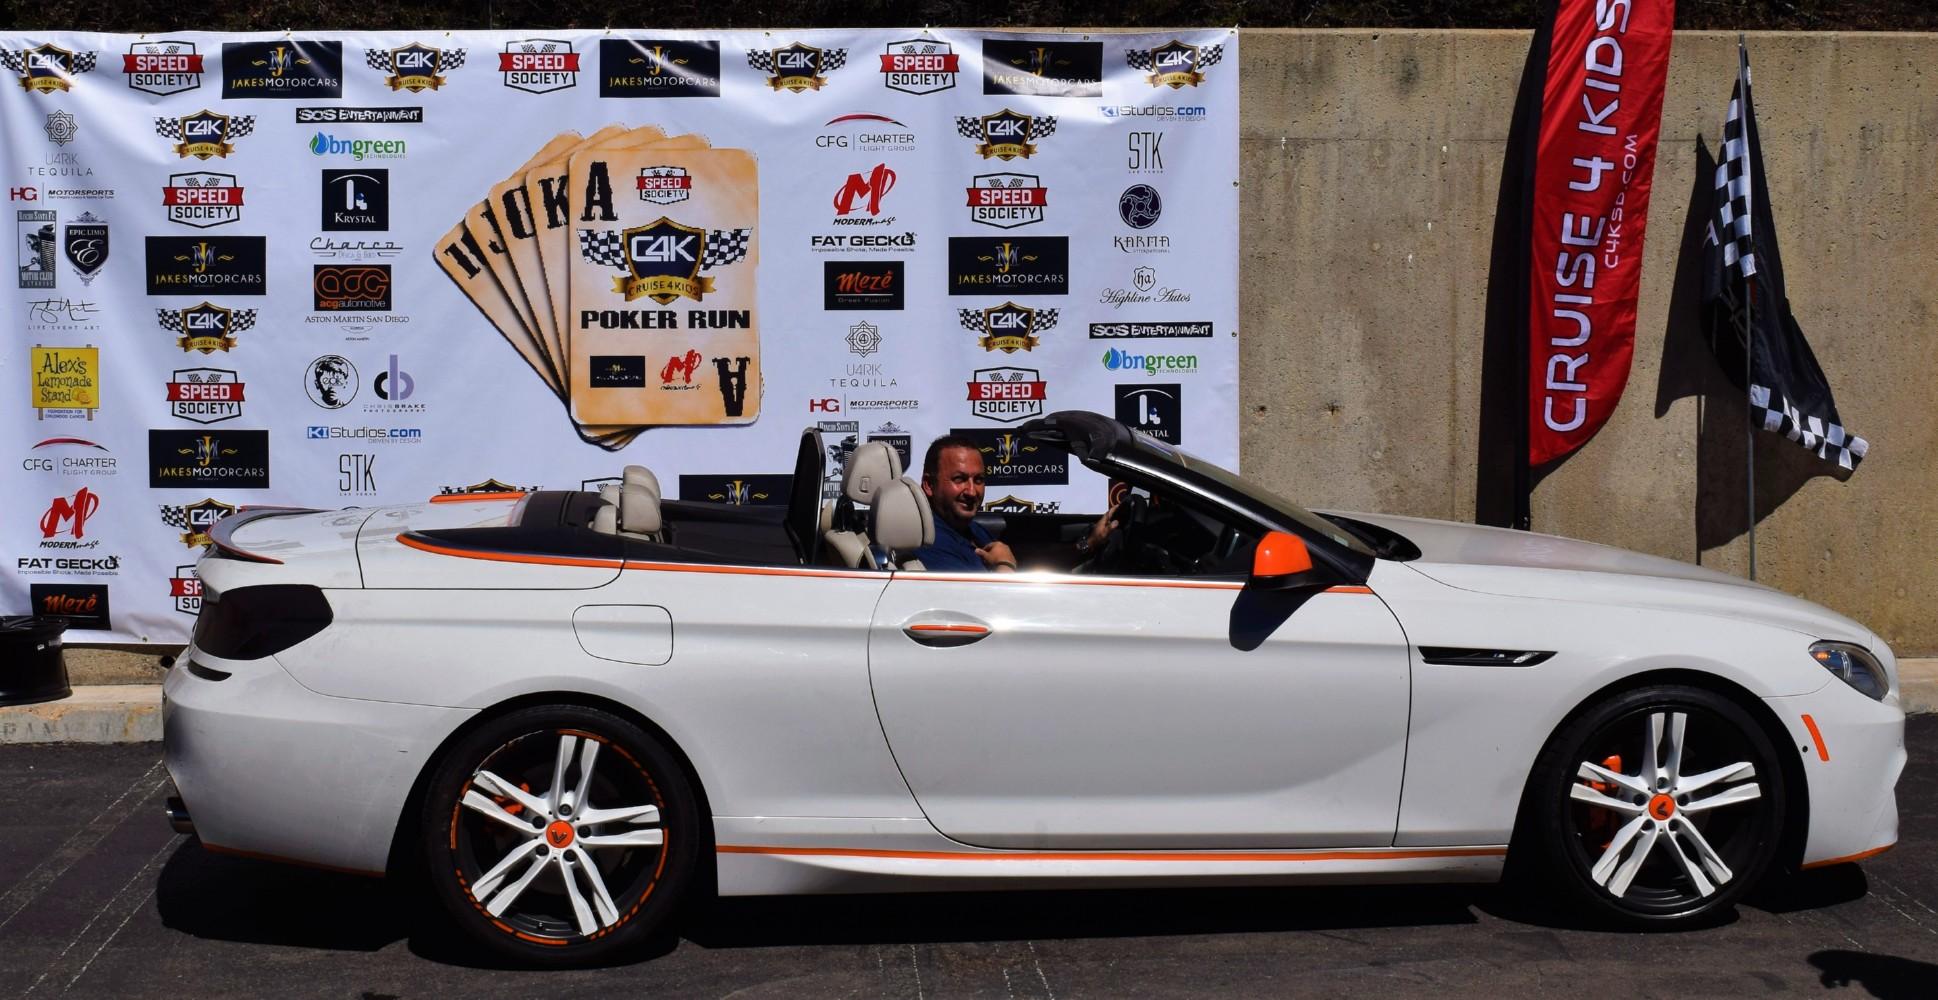 Poker Run 2017 Banner Photos - 23.jpg